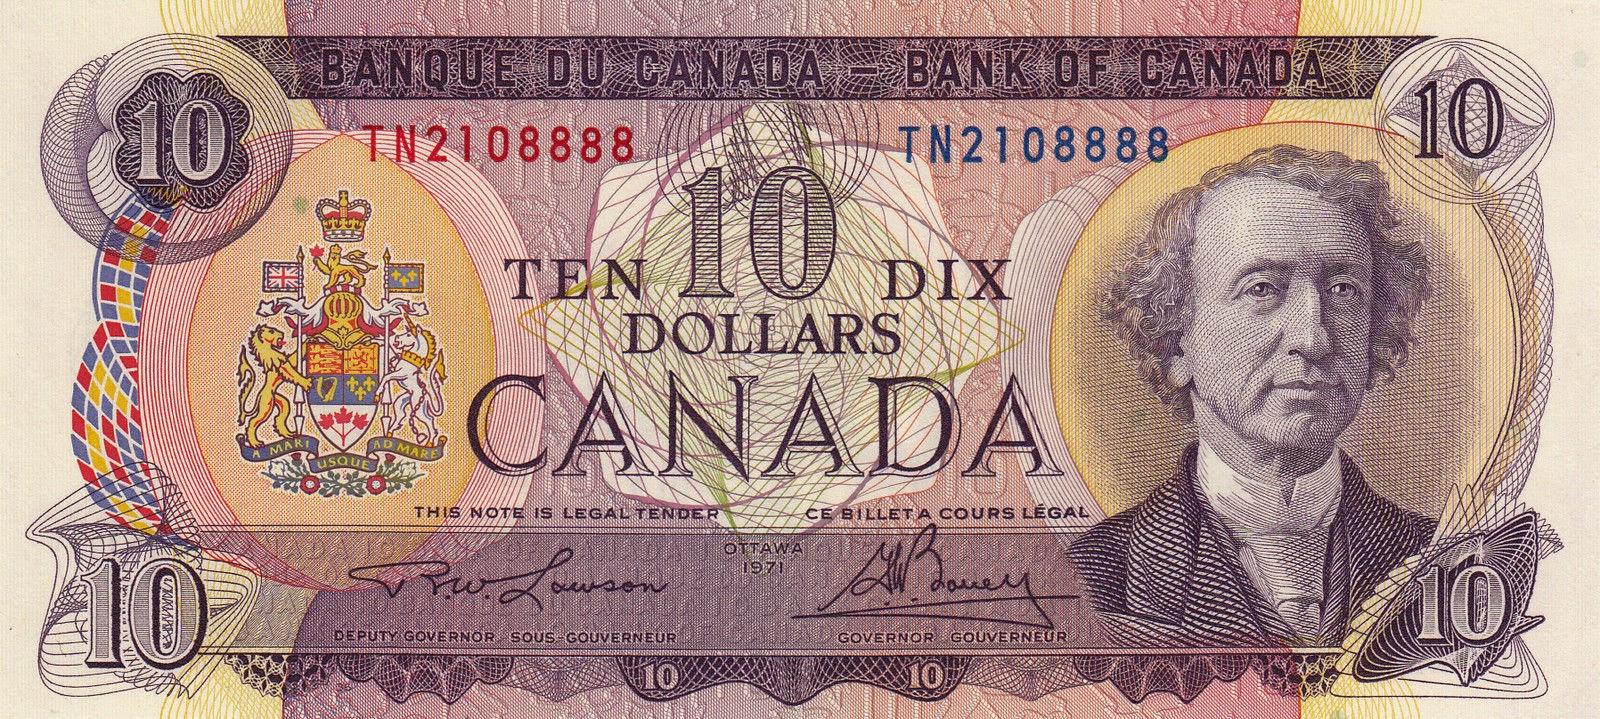 http://4.bp.blogspot.com/-X27EkIa17Pw/VV4Ynm-qwiI/AAAAAAAAImU/VHgm0pRo0Ok/s1600/Canada%2B10%2BDollar%2BNote%2B1971%2BSir%2BJohn%2BA.%2BMacdonald.JPG